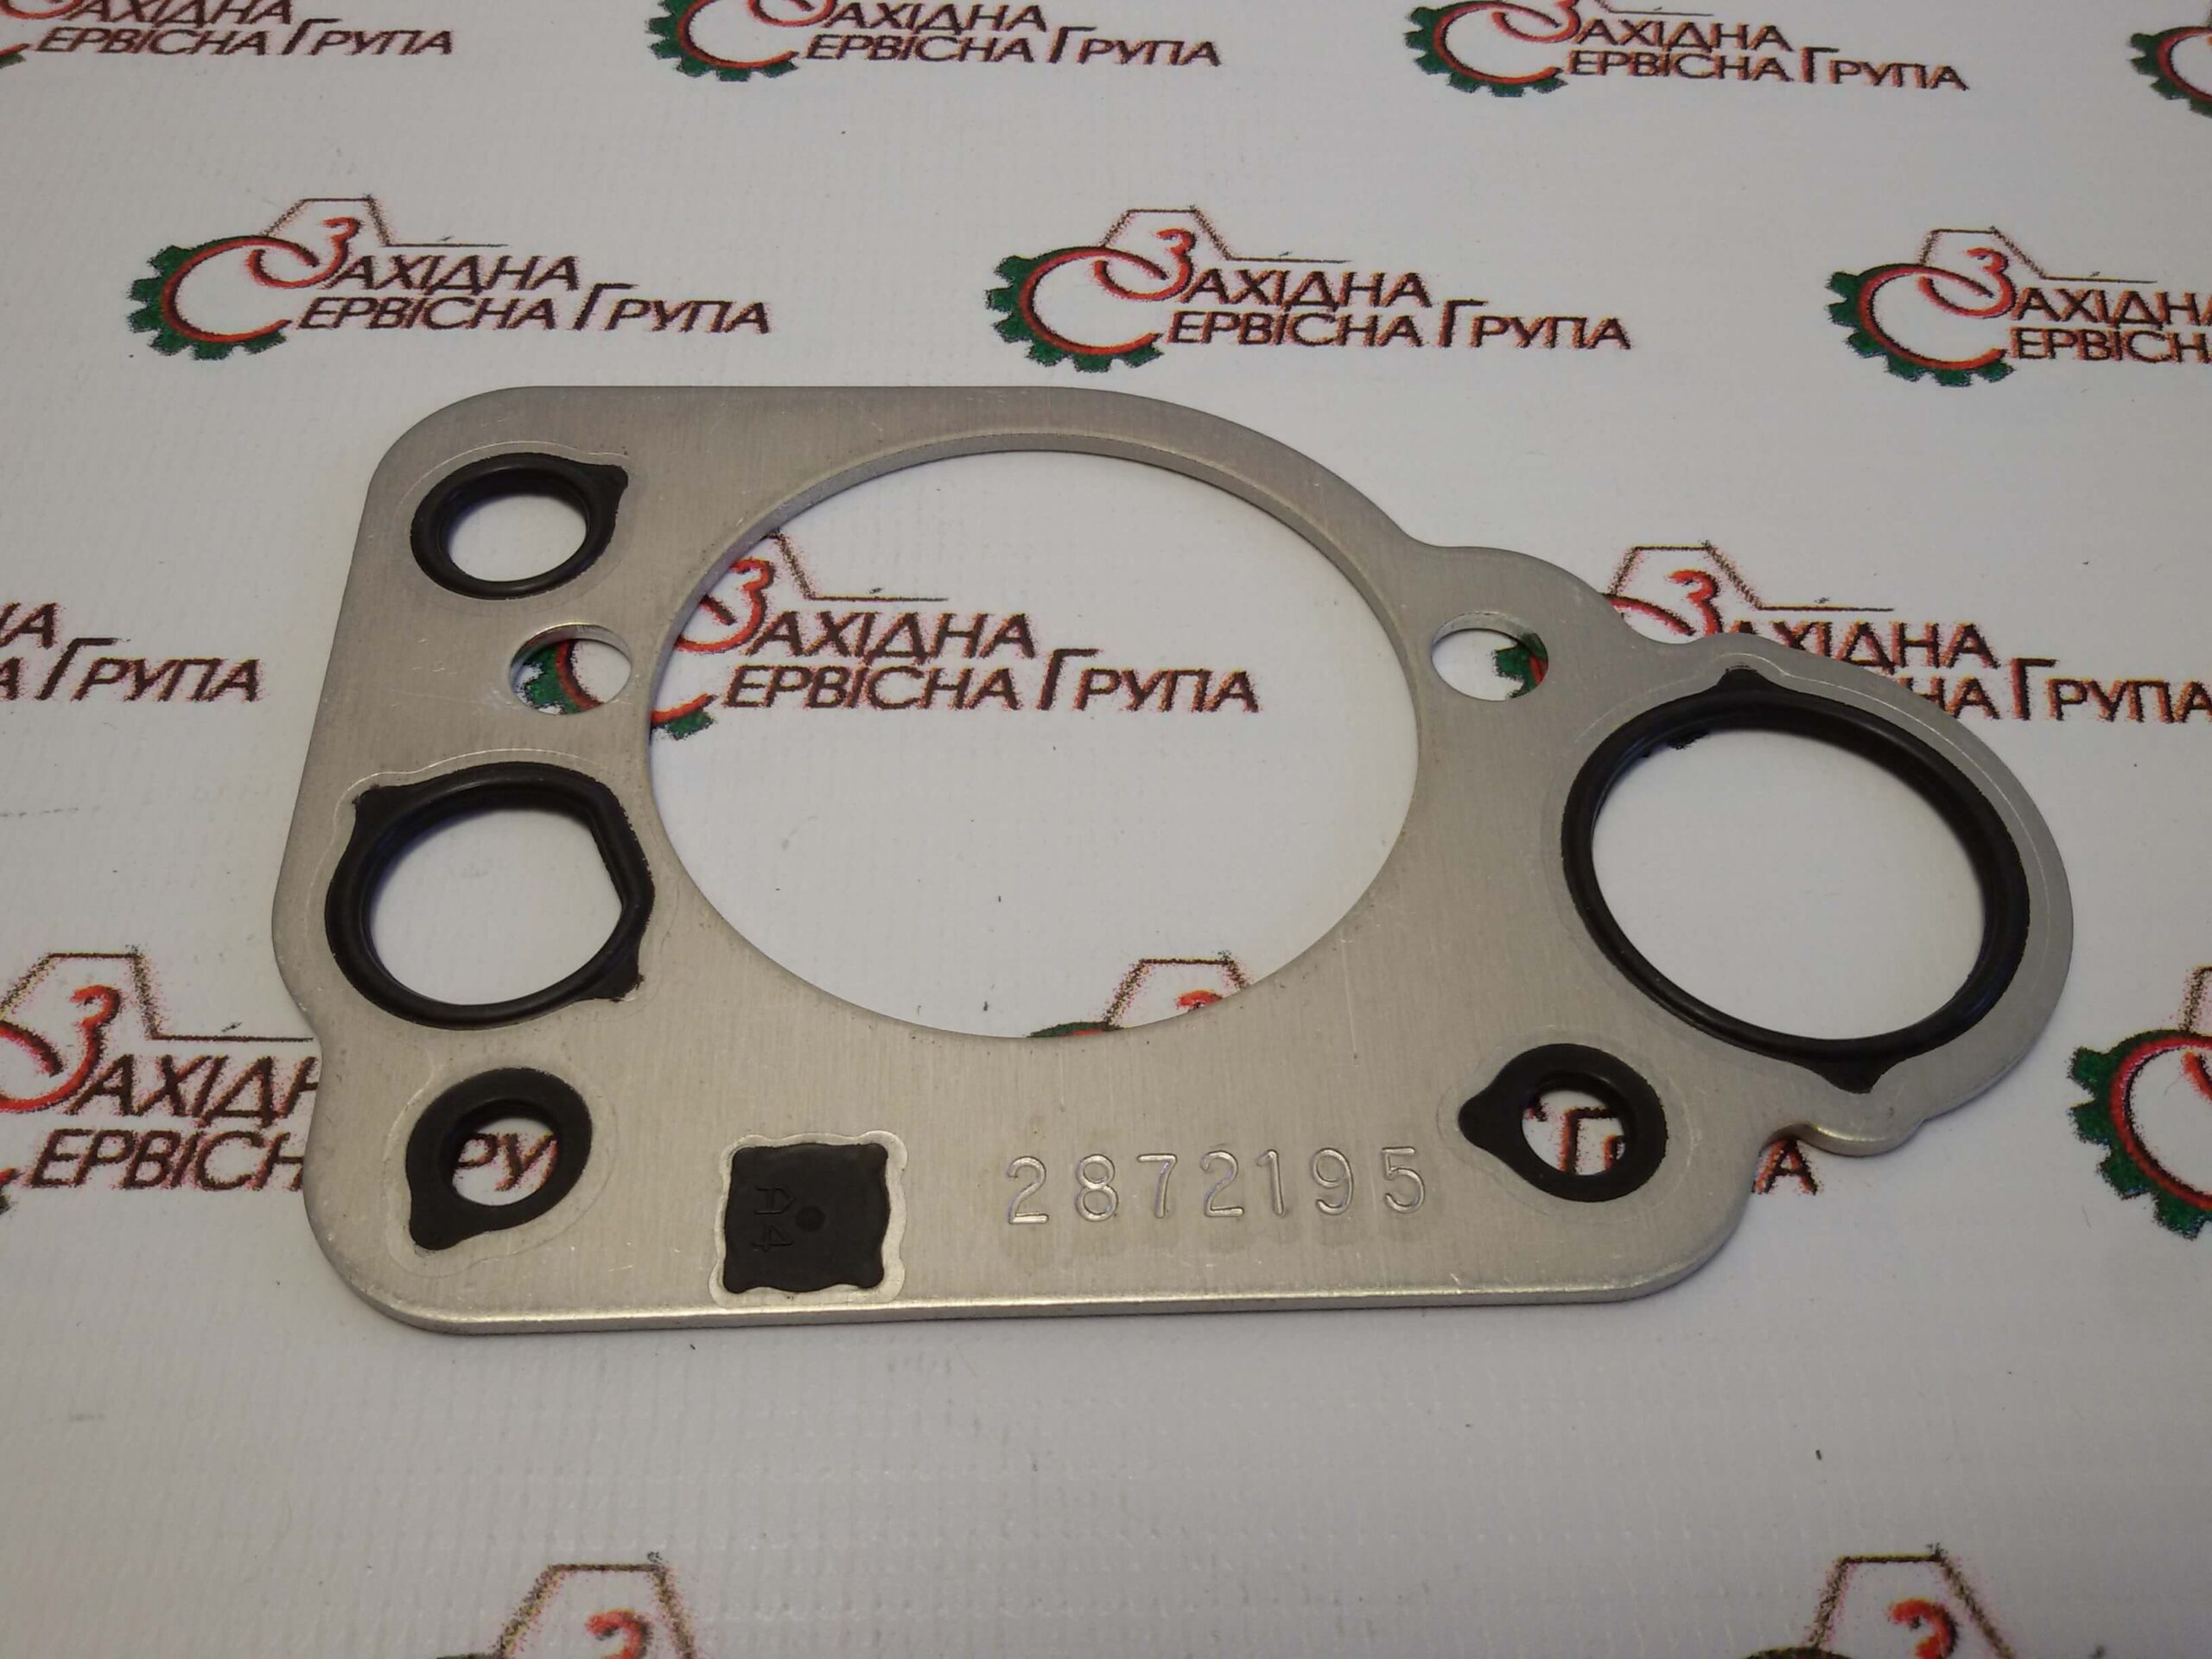 Прокладка топливного насоса Cummins ISX15, QSX15, 2872195, 4954472, 4062005.